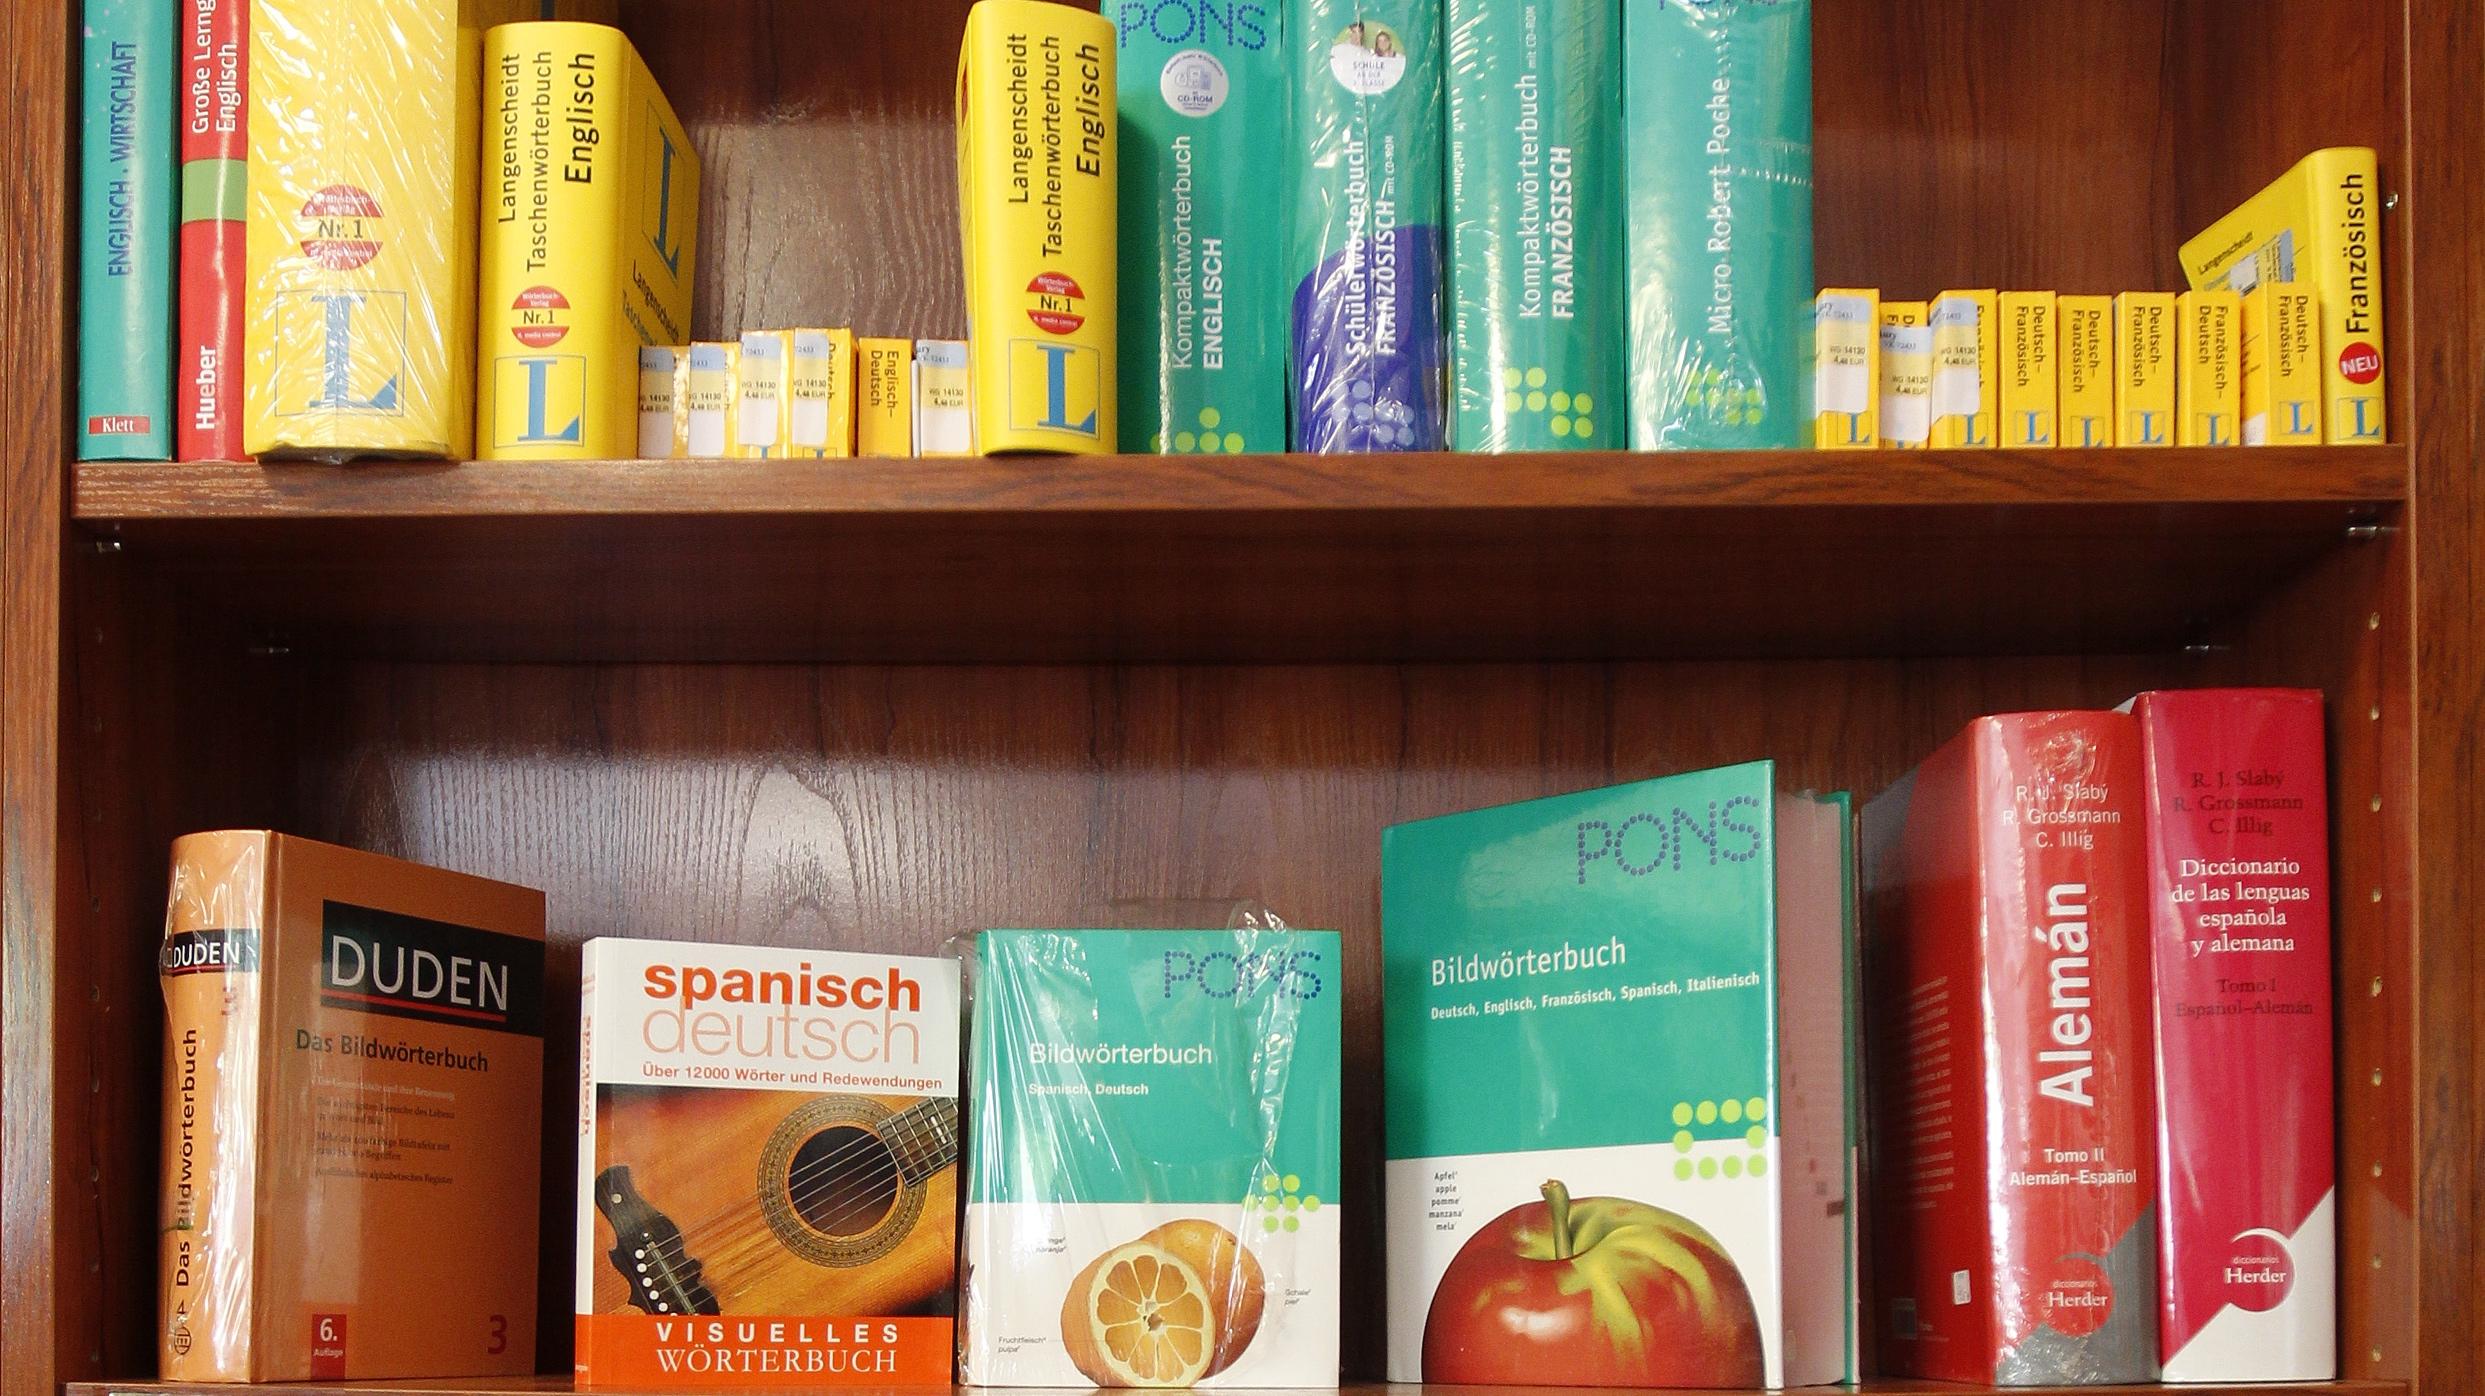 Dictionaries in different languages.